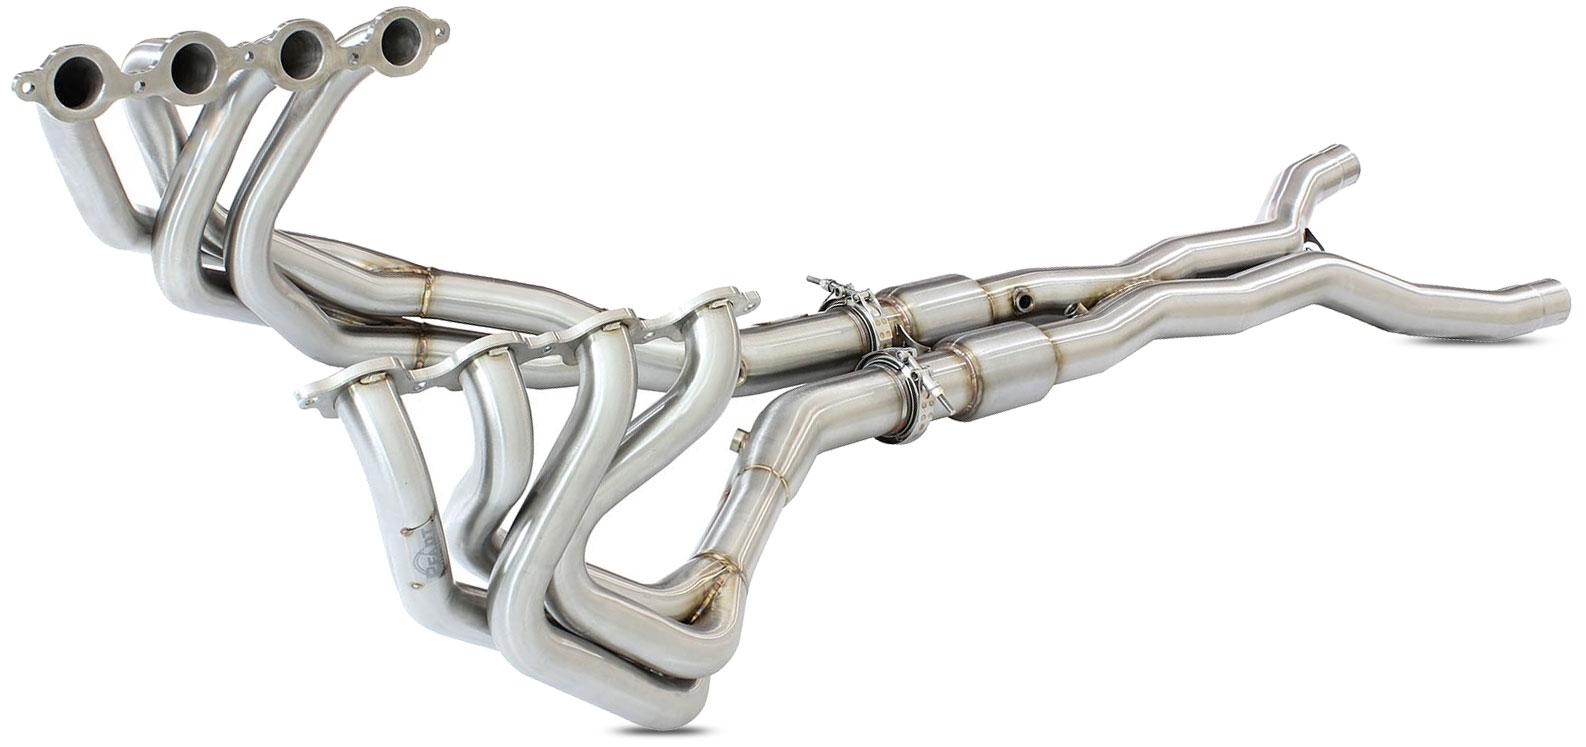 PFADT Series Tri-Y Long Tube Header & X-Pipe (Street Series)